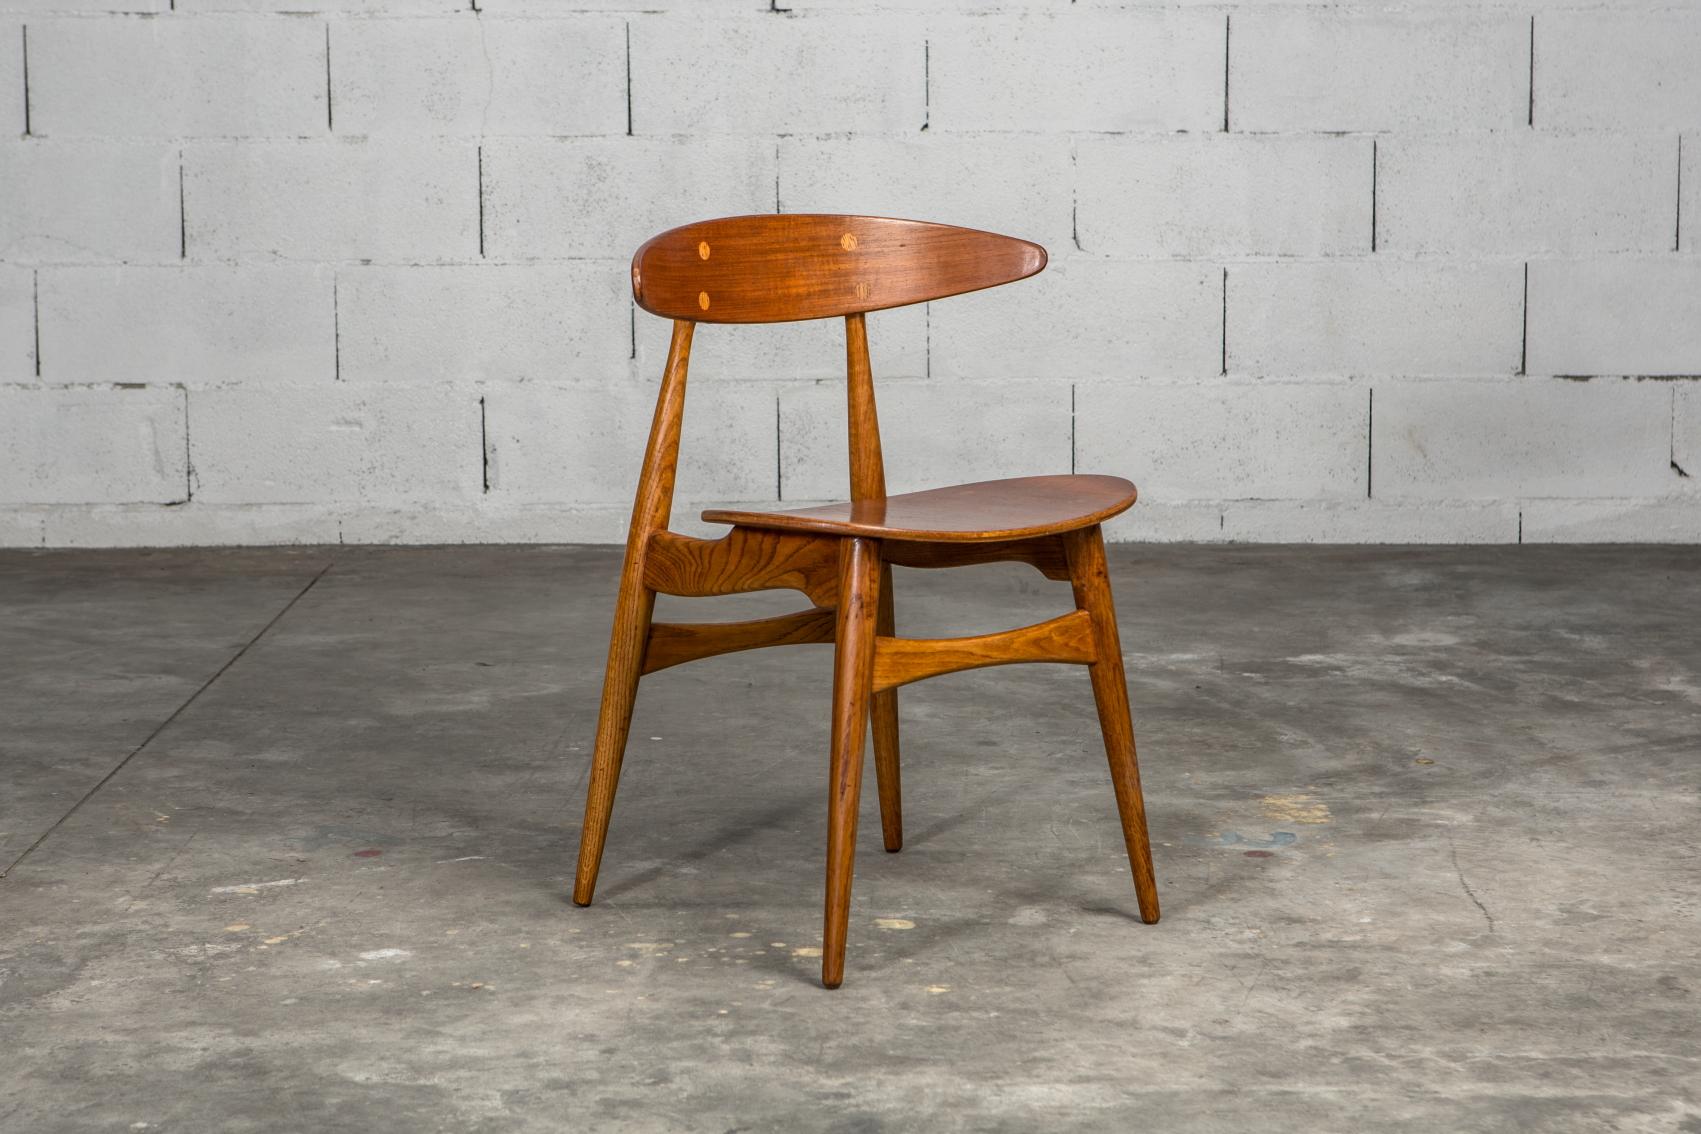 Molded teak backrests and oak frames CH 33 chairs - Hans J. Wegner for Carl Hansen & Son - 3/4 front view